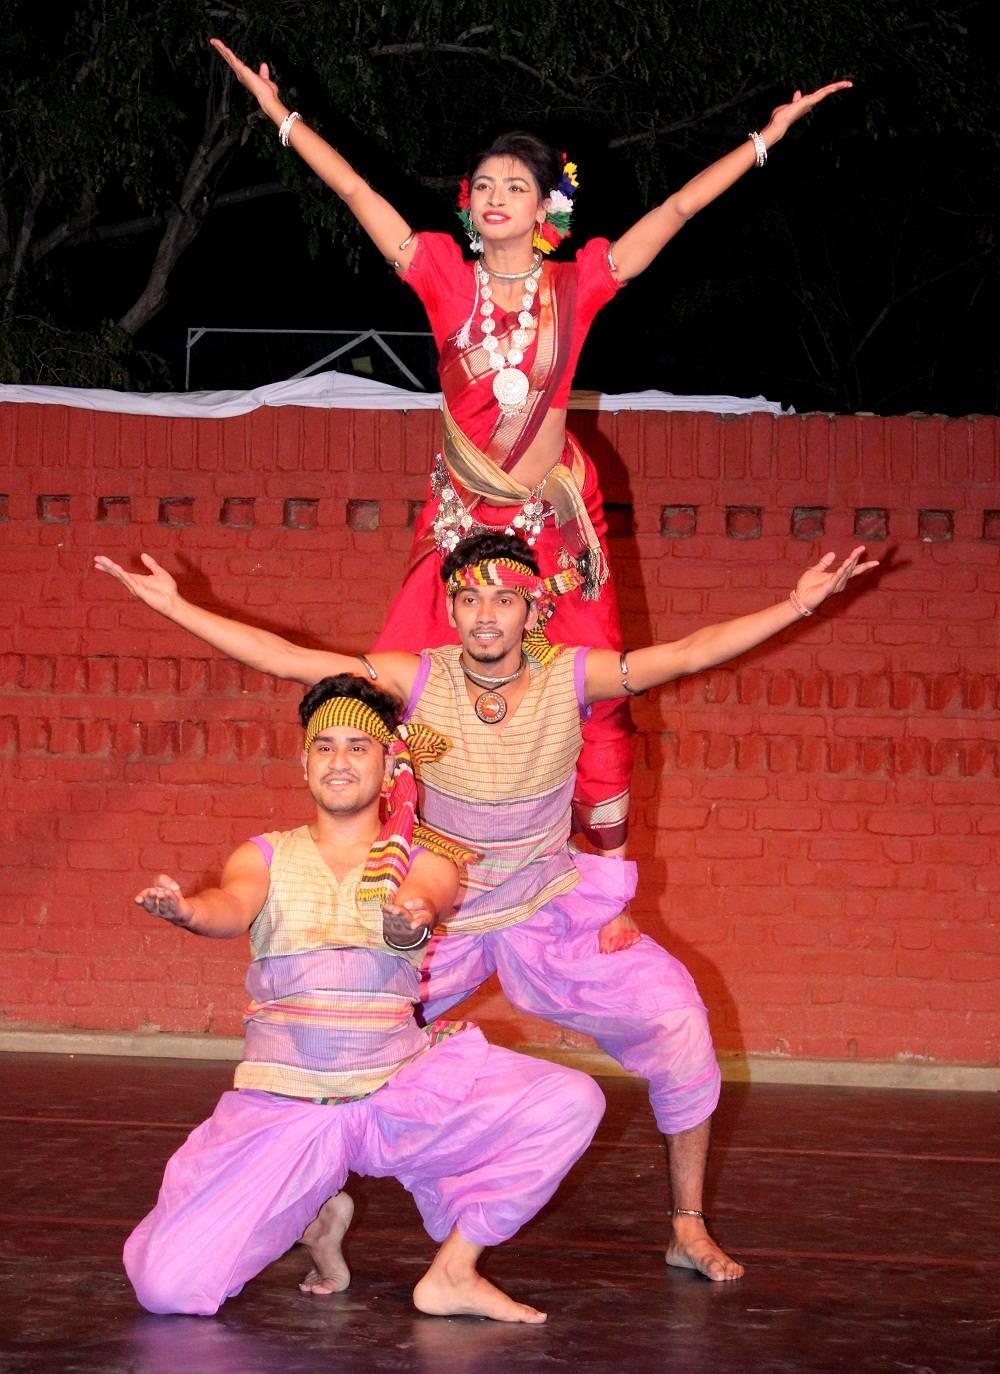 Tahnun, Alif and Maati from Bangladesh